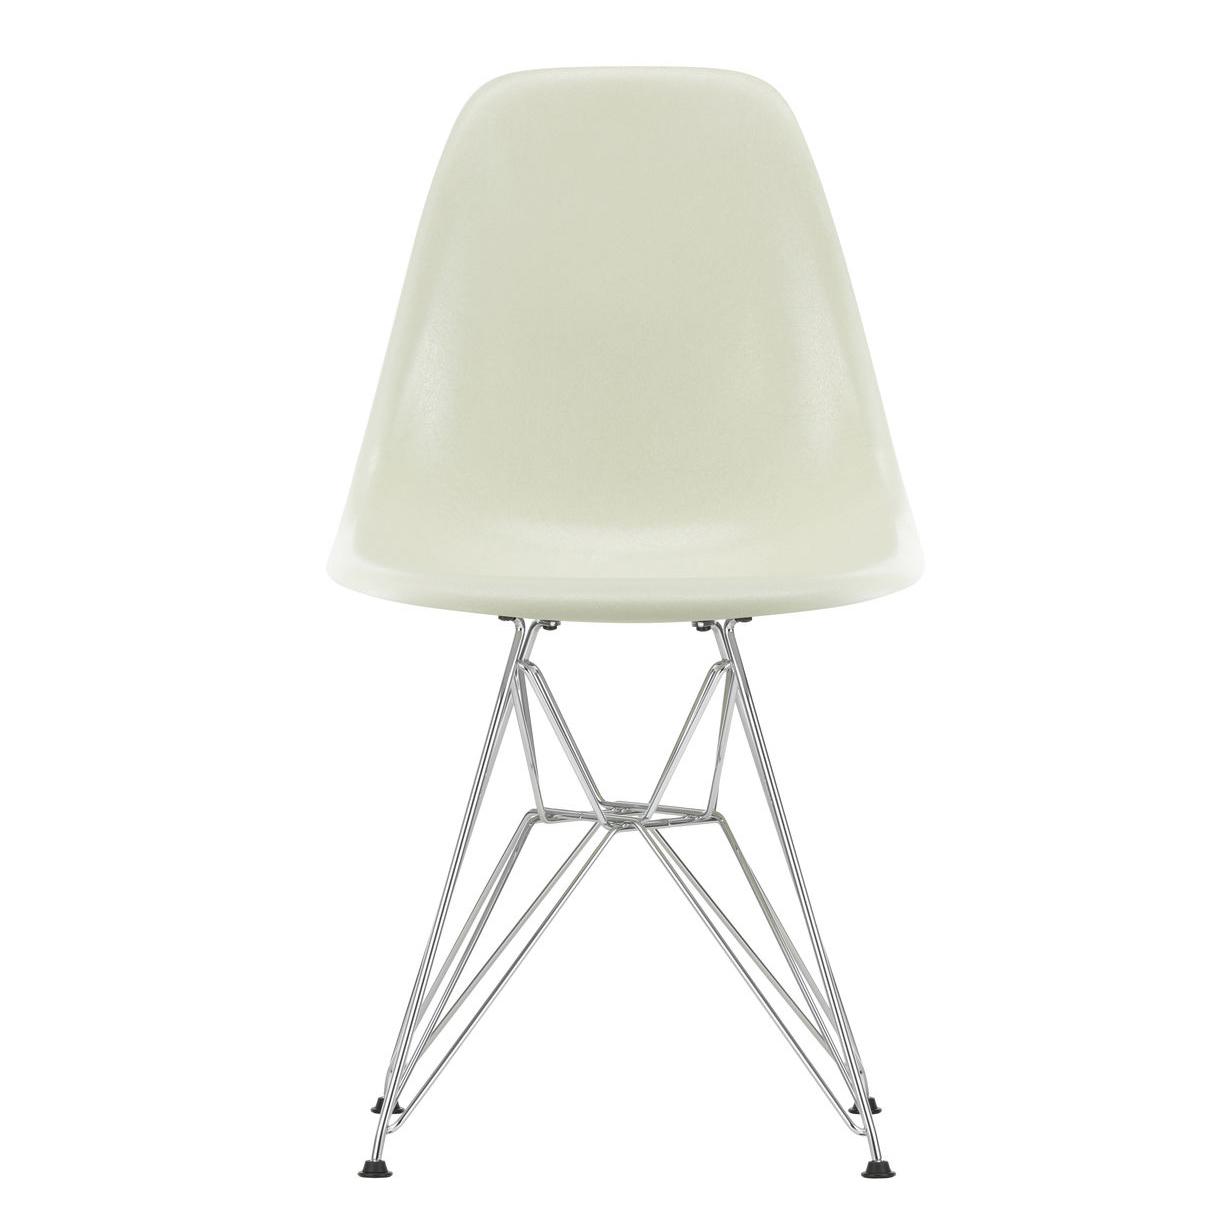 Vitra Fiberglass Chair DSR